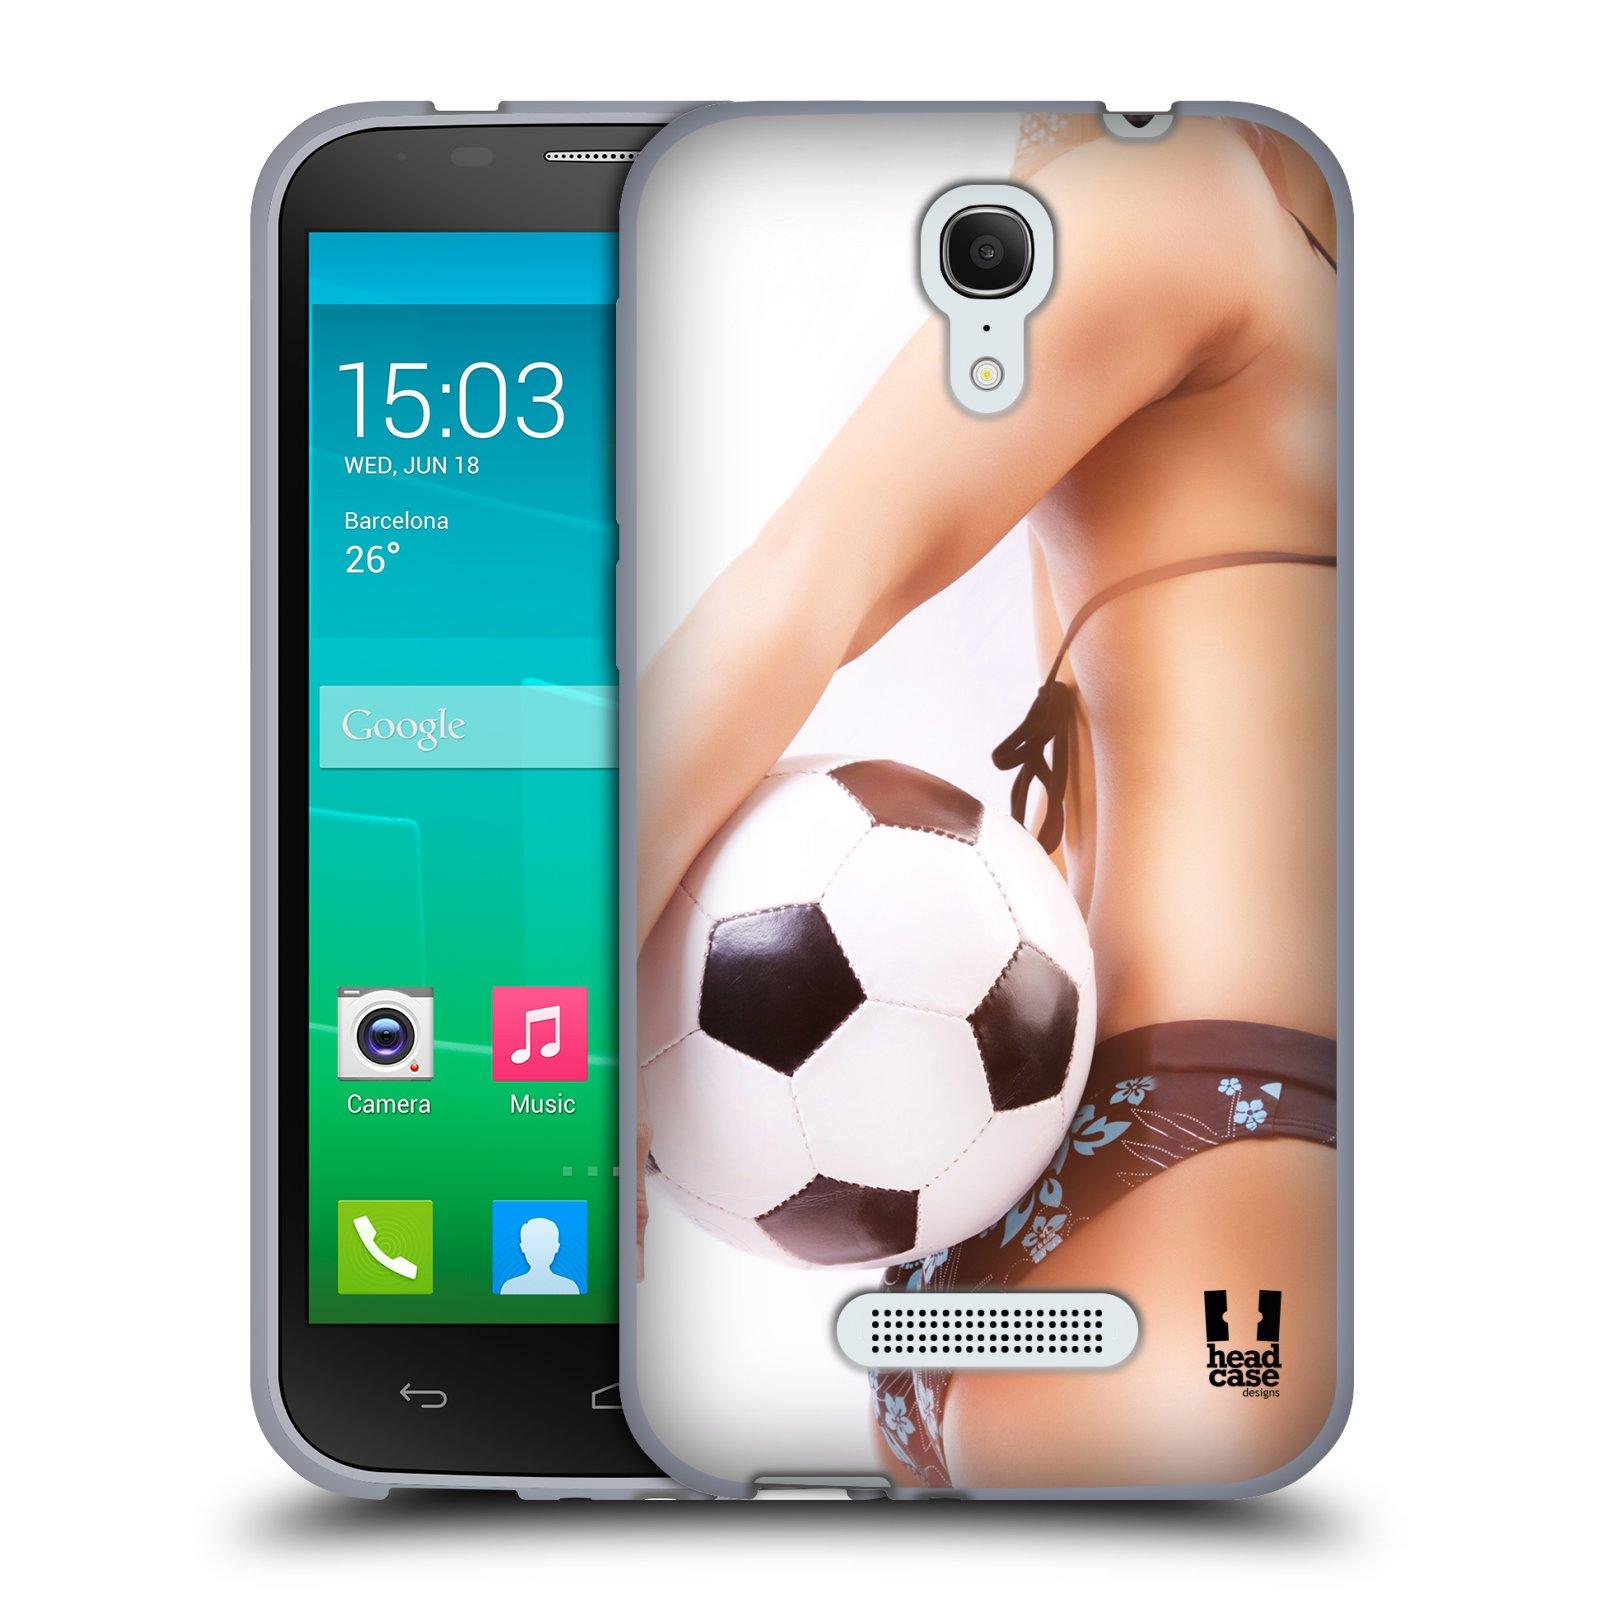 HEAD CASE silikonový obal na mobil Alcatel POP S7 vzor Fotbalové modelky KOPACÍ MÍČ